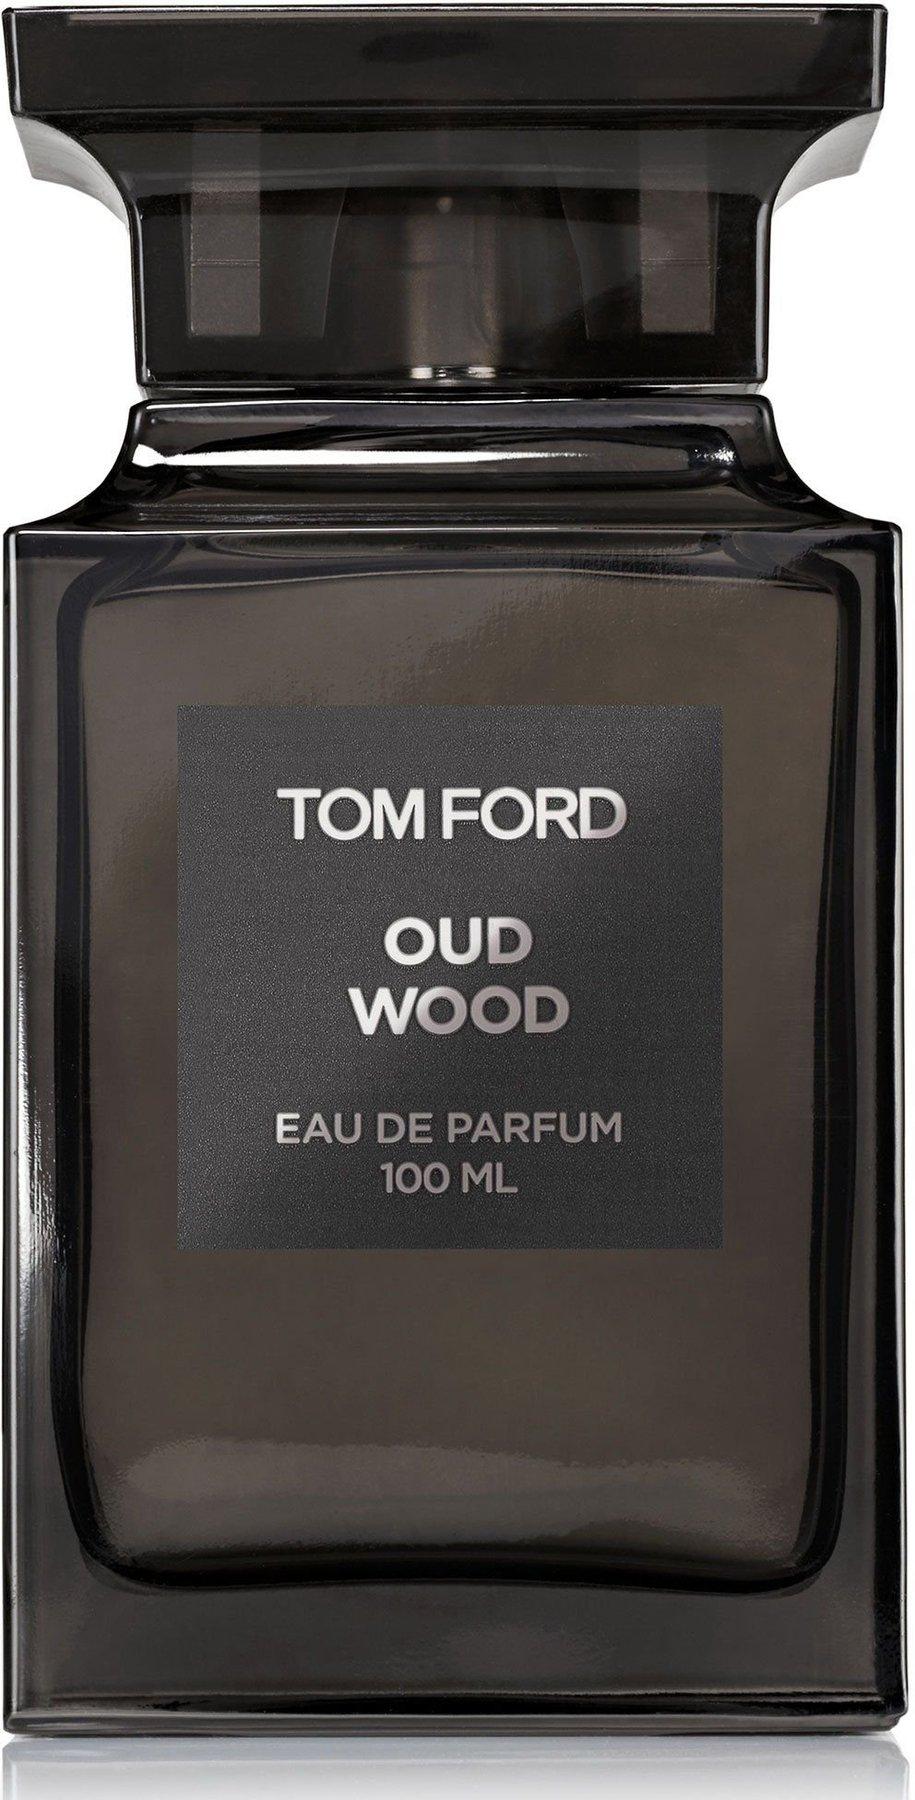 Tom Ford Oud Wood Eau De Parfum Ab 8081 Im Preisvergleich Kaufen